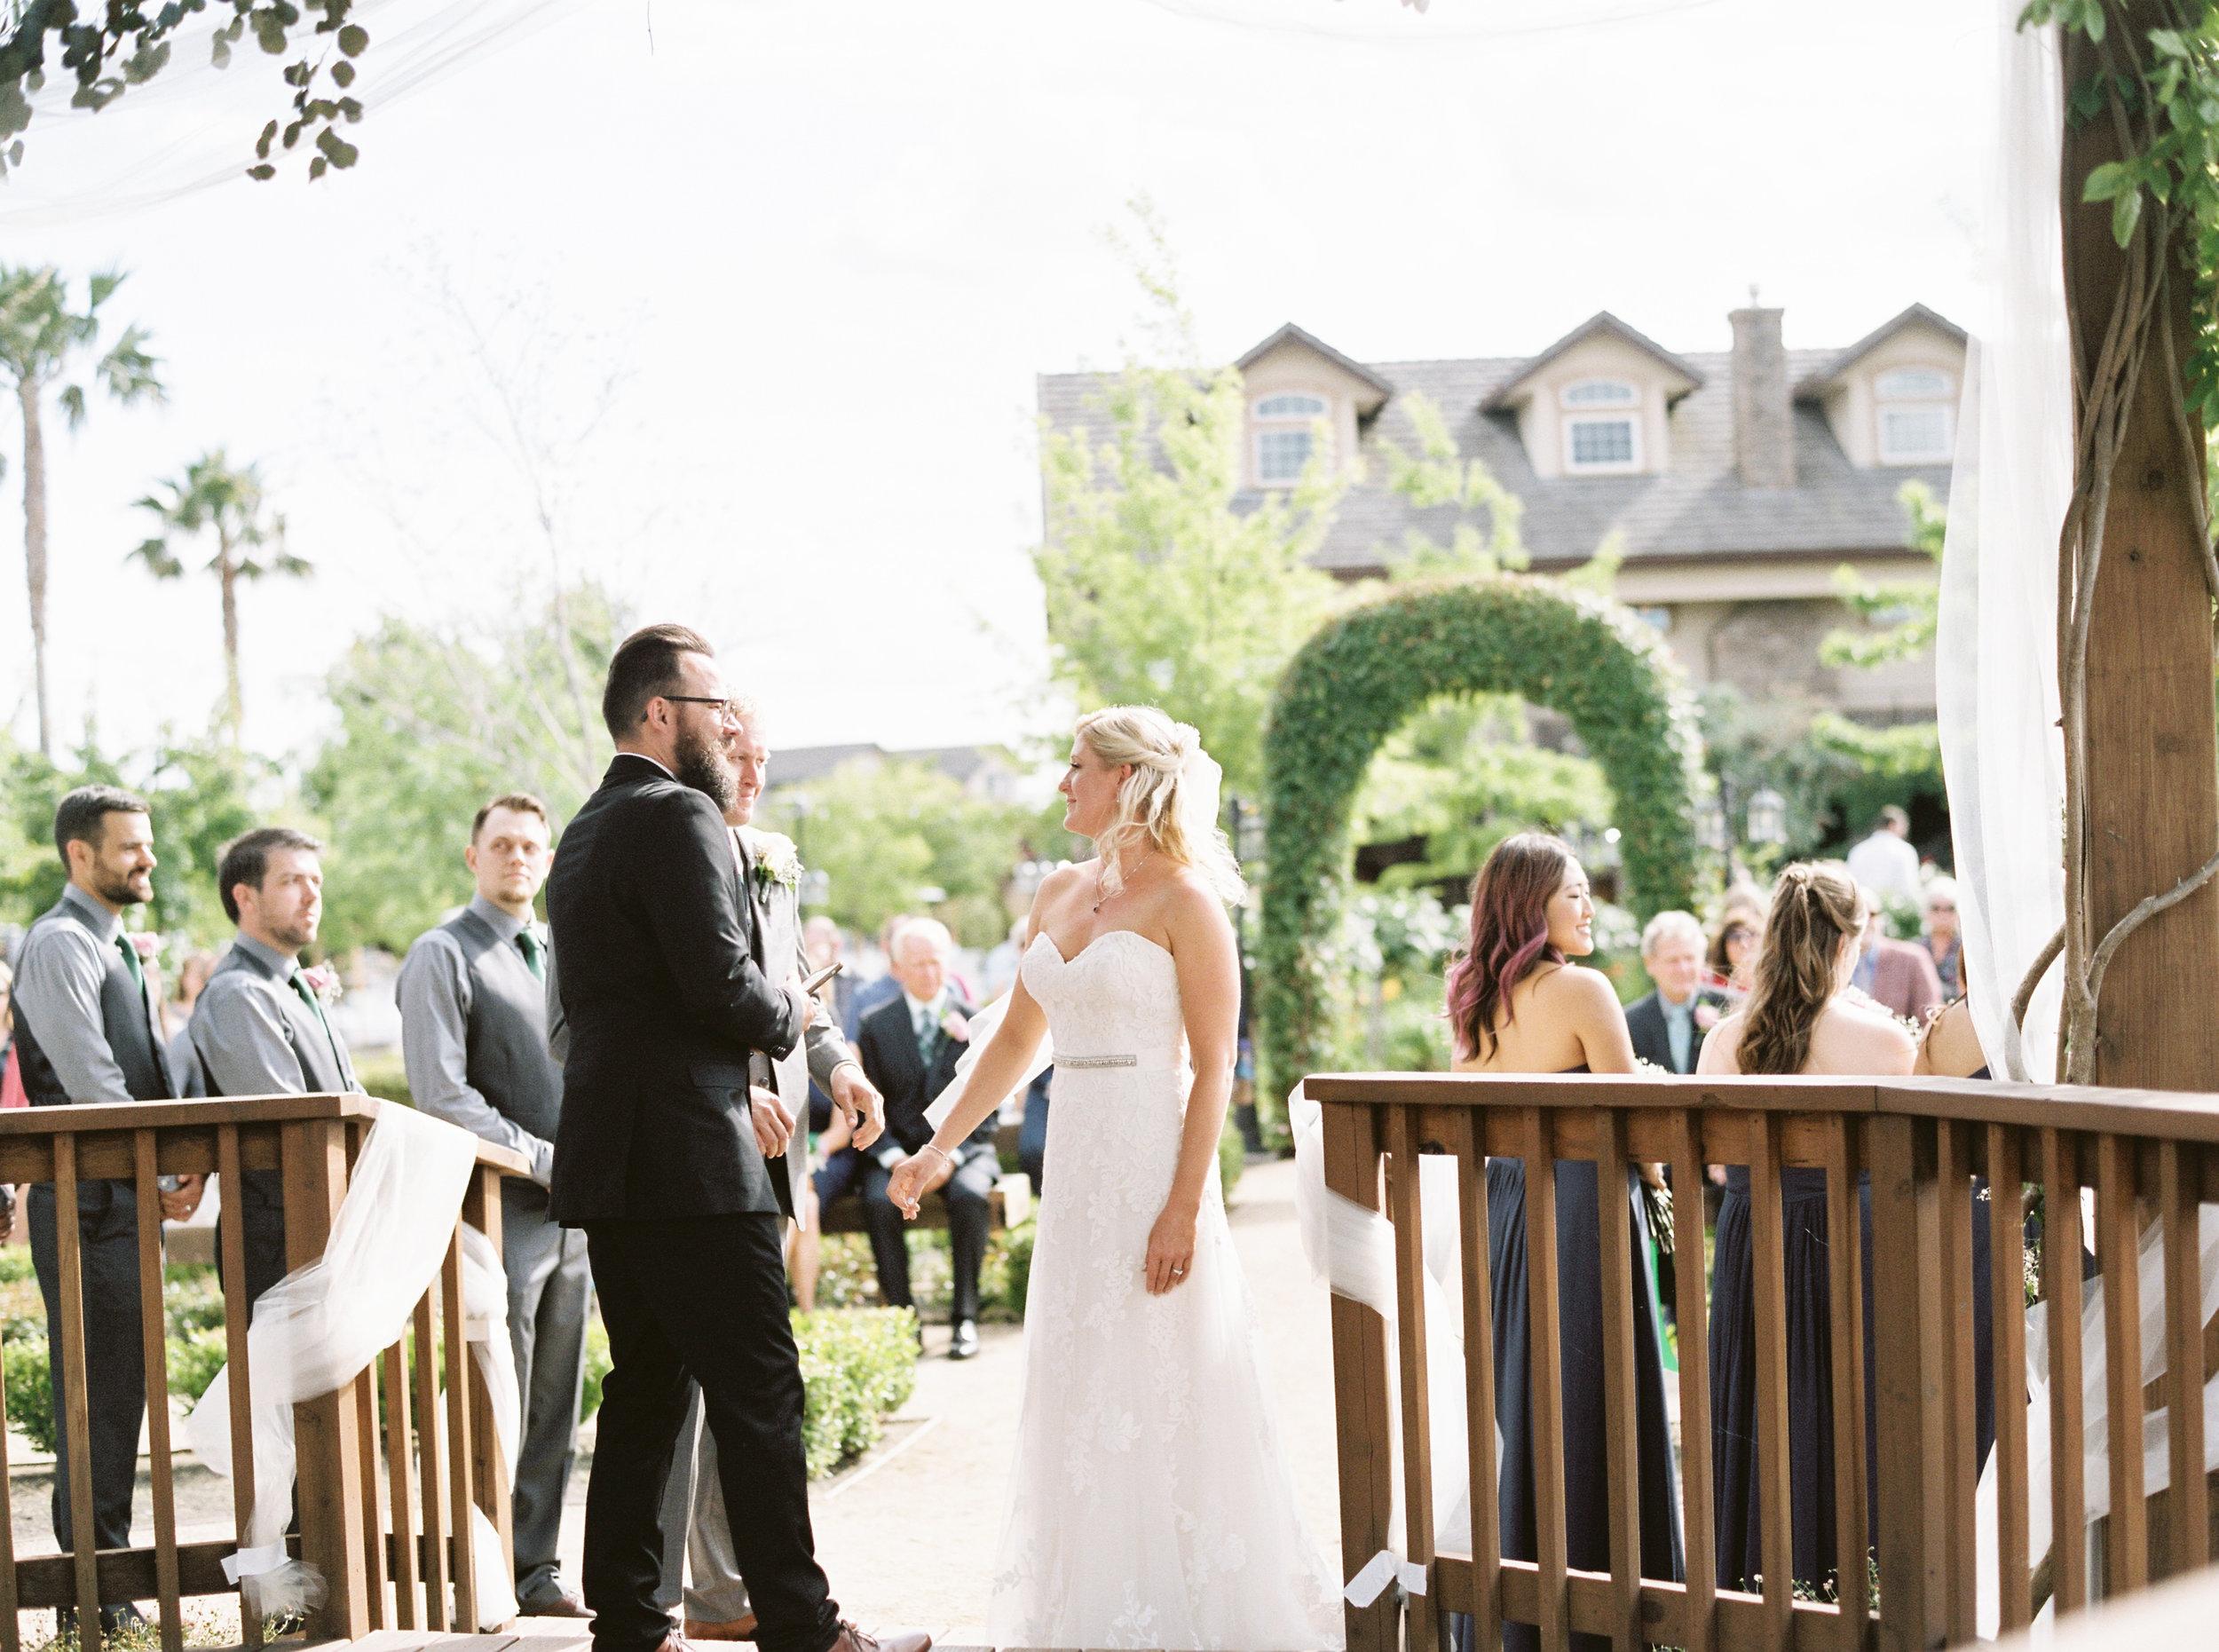 wolfe-heights-event-center-wedding-sacramento-california-wedding-34.jpg